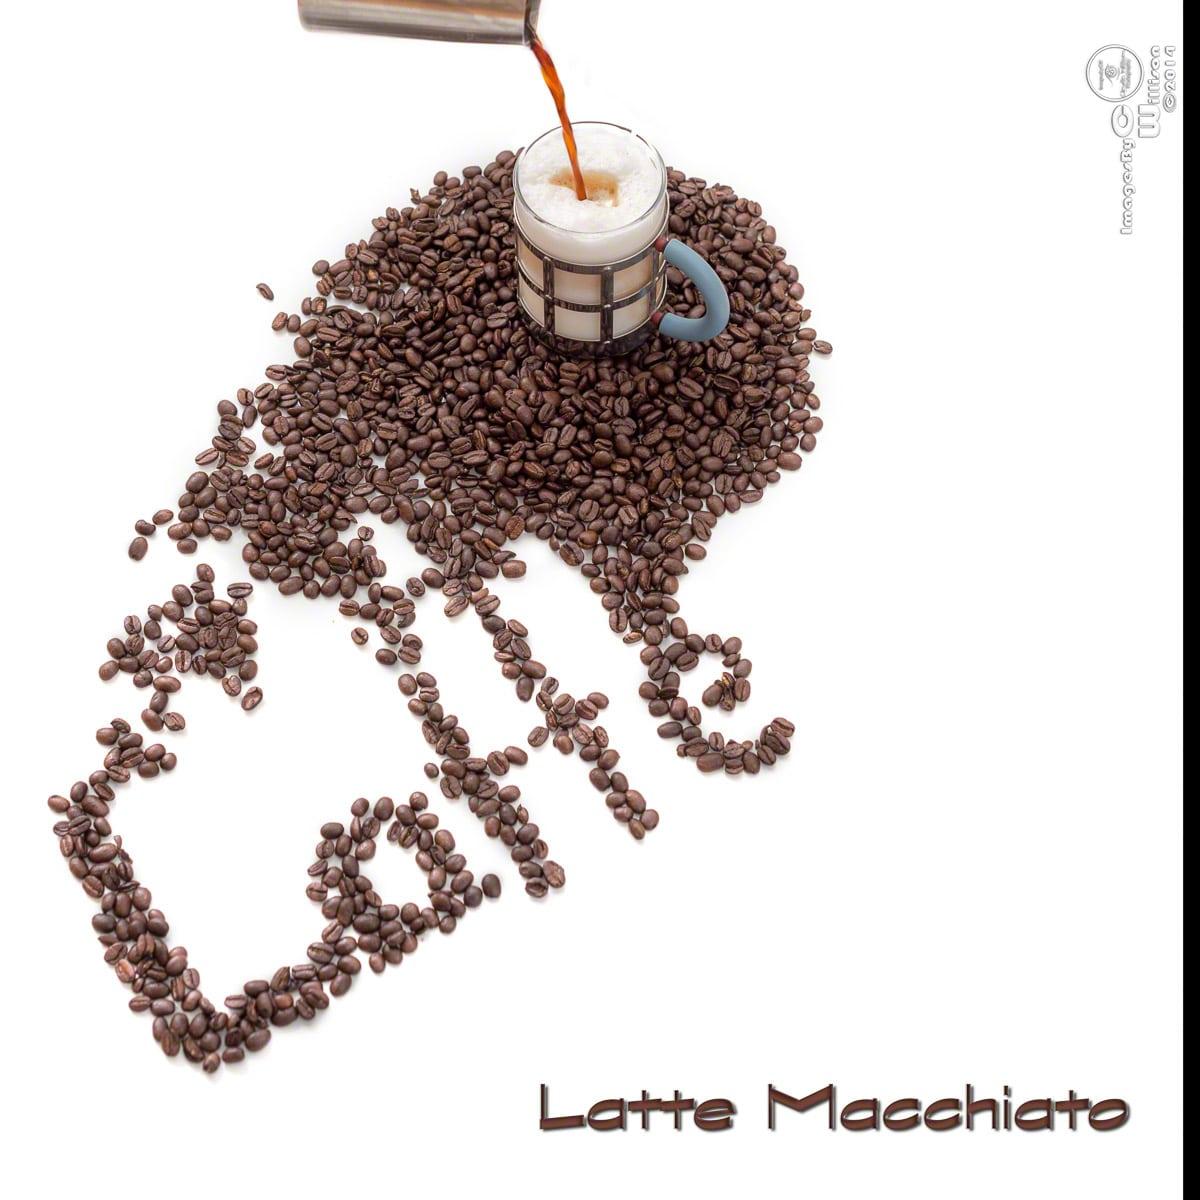 coffee, beans, latte